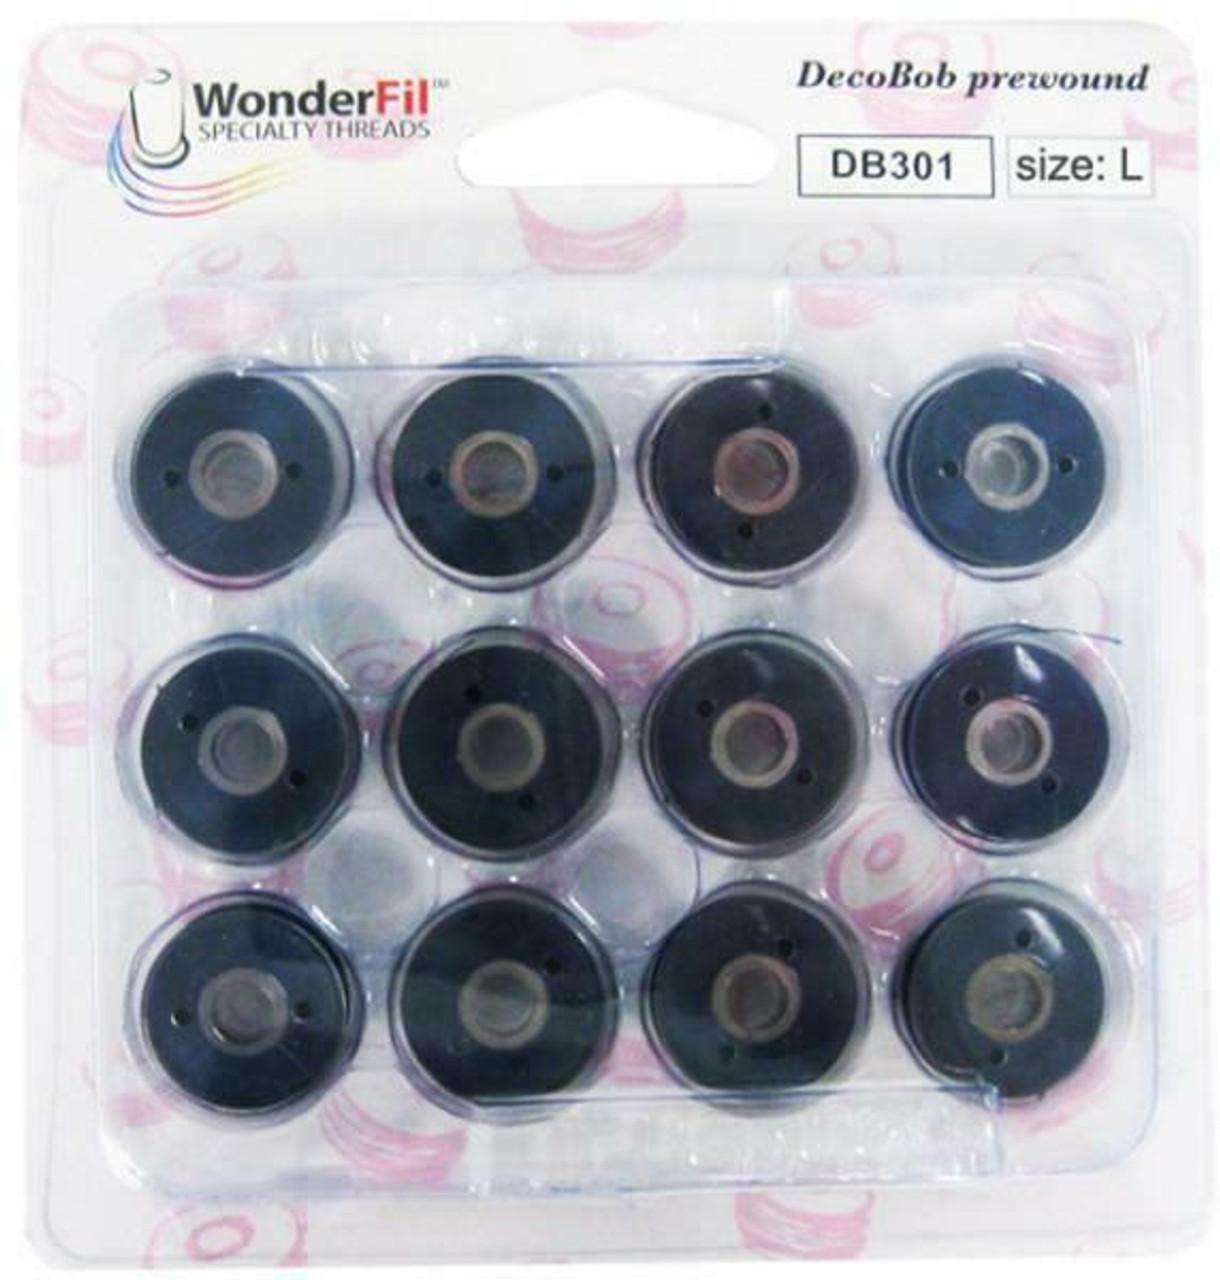 Wonder-Fil DecoBob Prewound Bobbins Size L: Navy